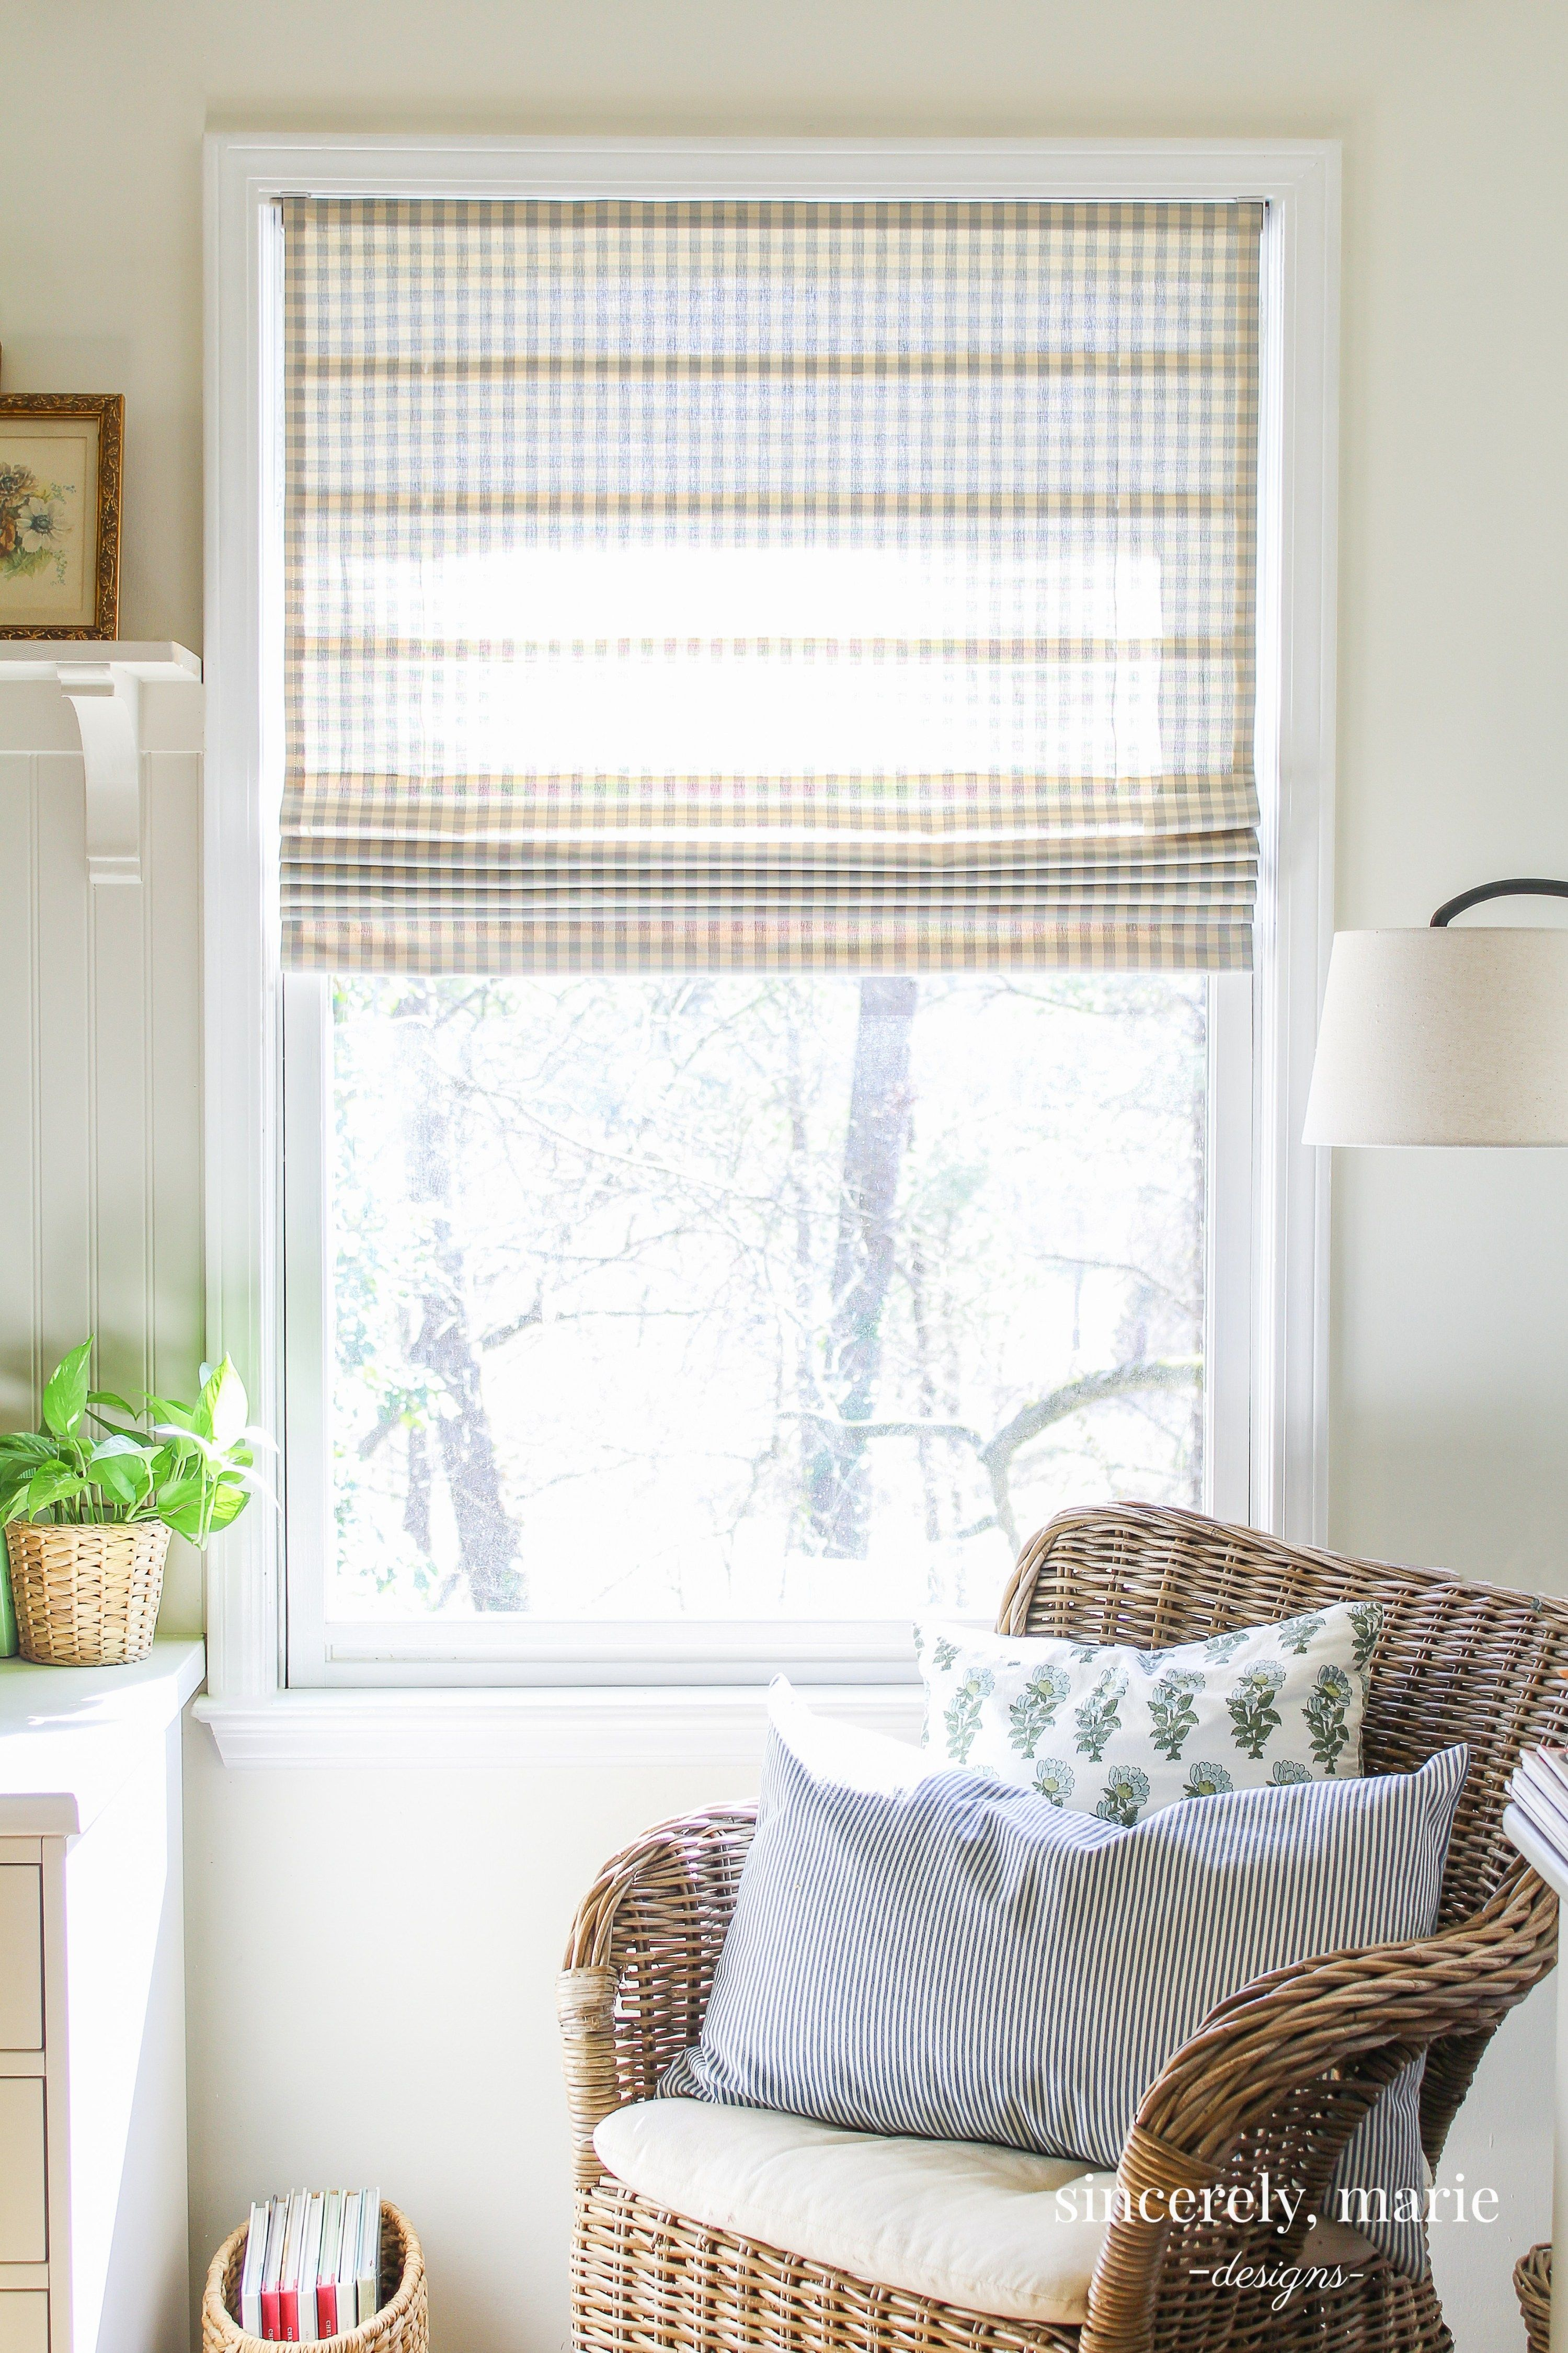 Easy DIY Roman Shade Diy roman shades, Decor, Home